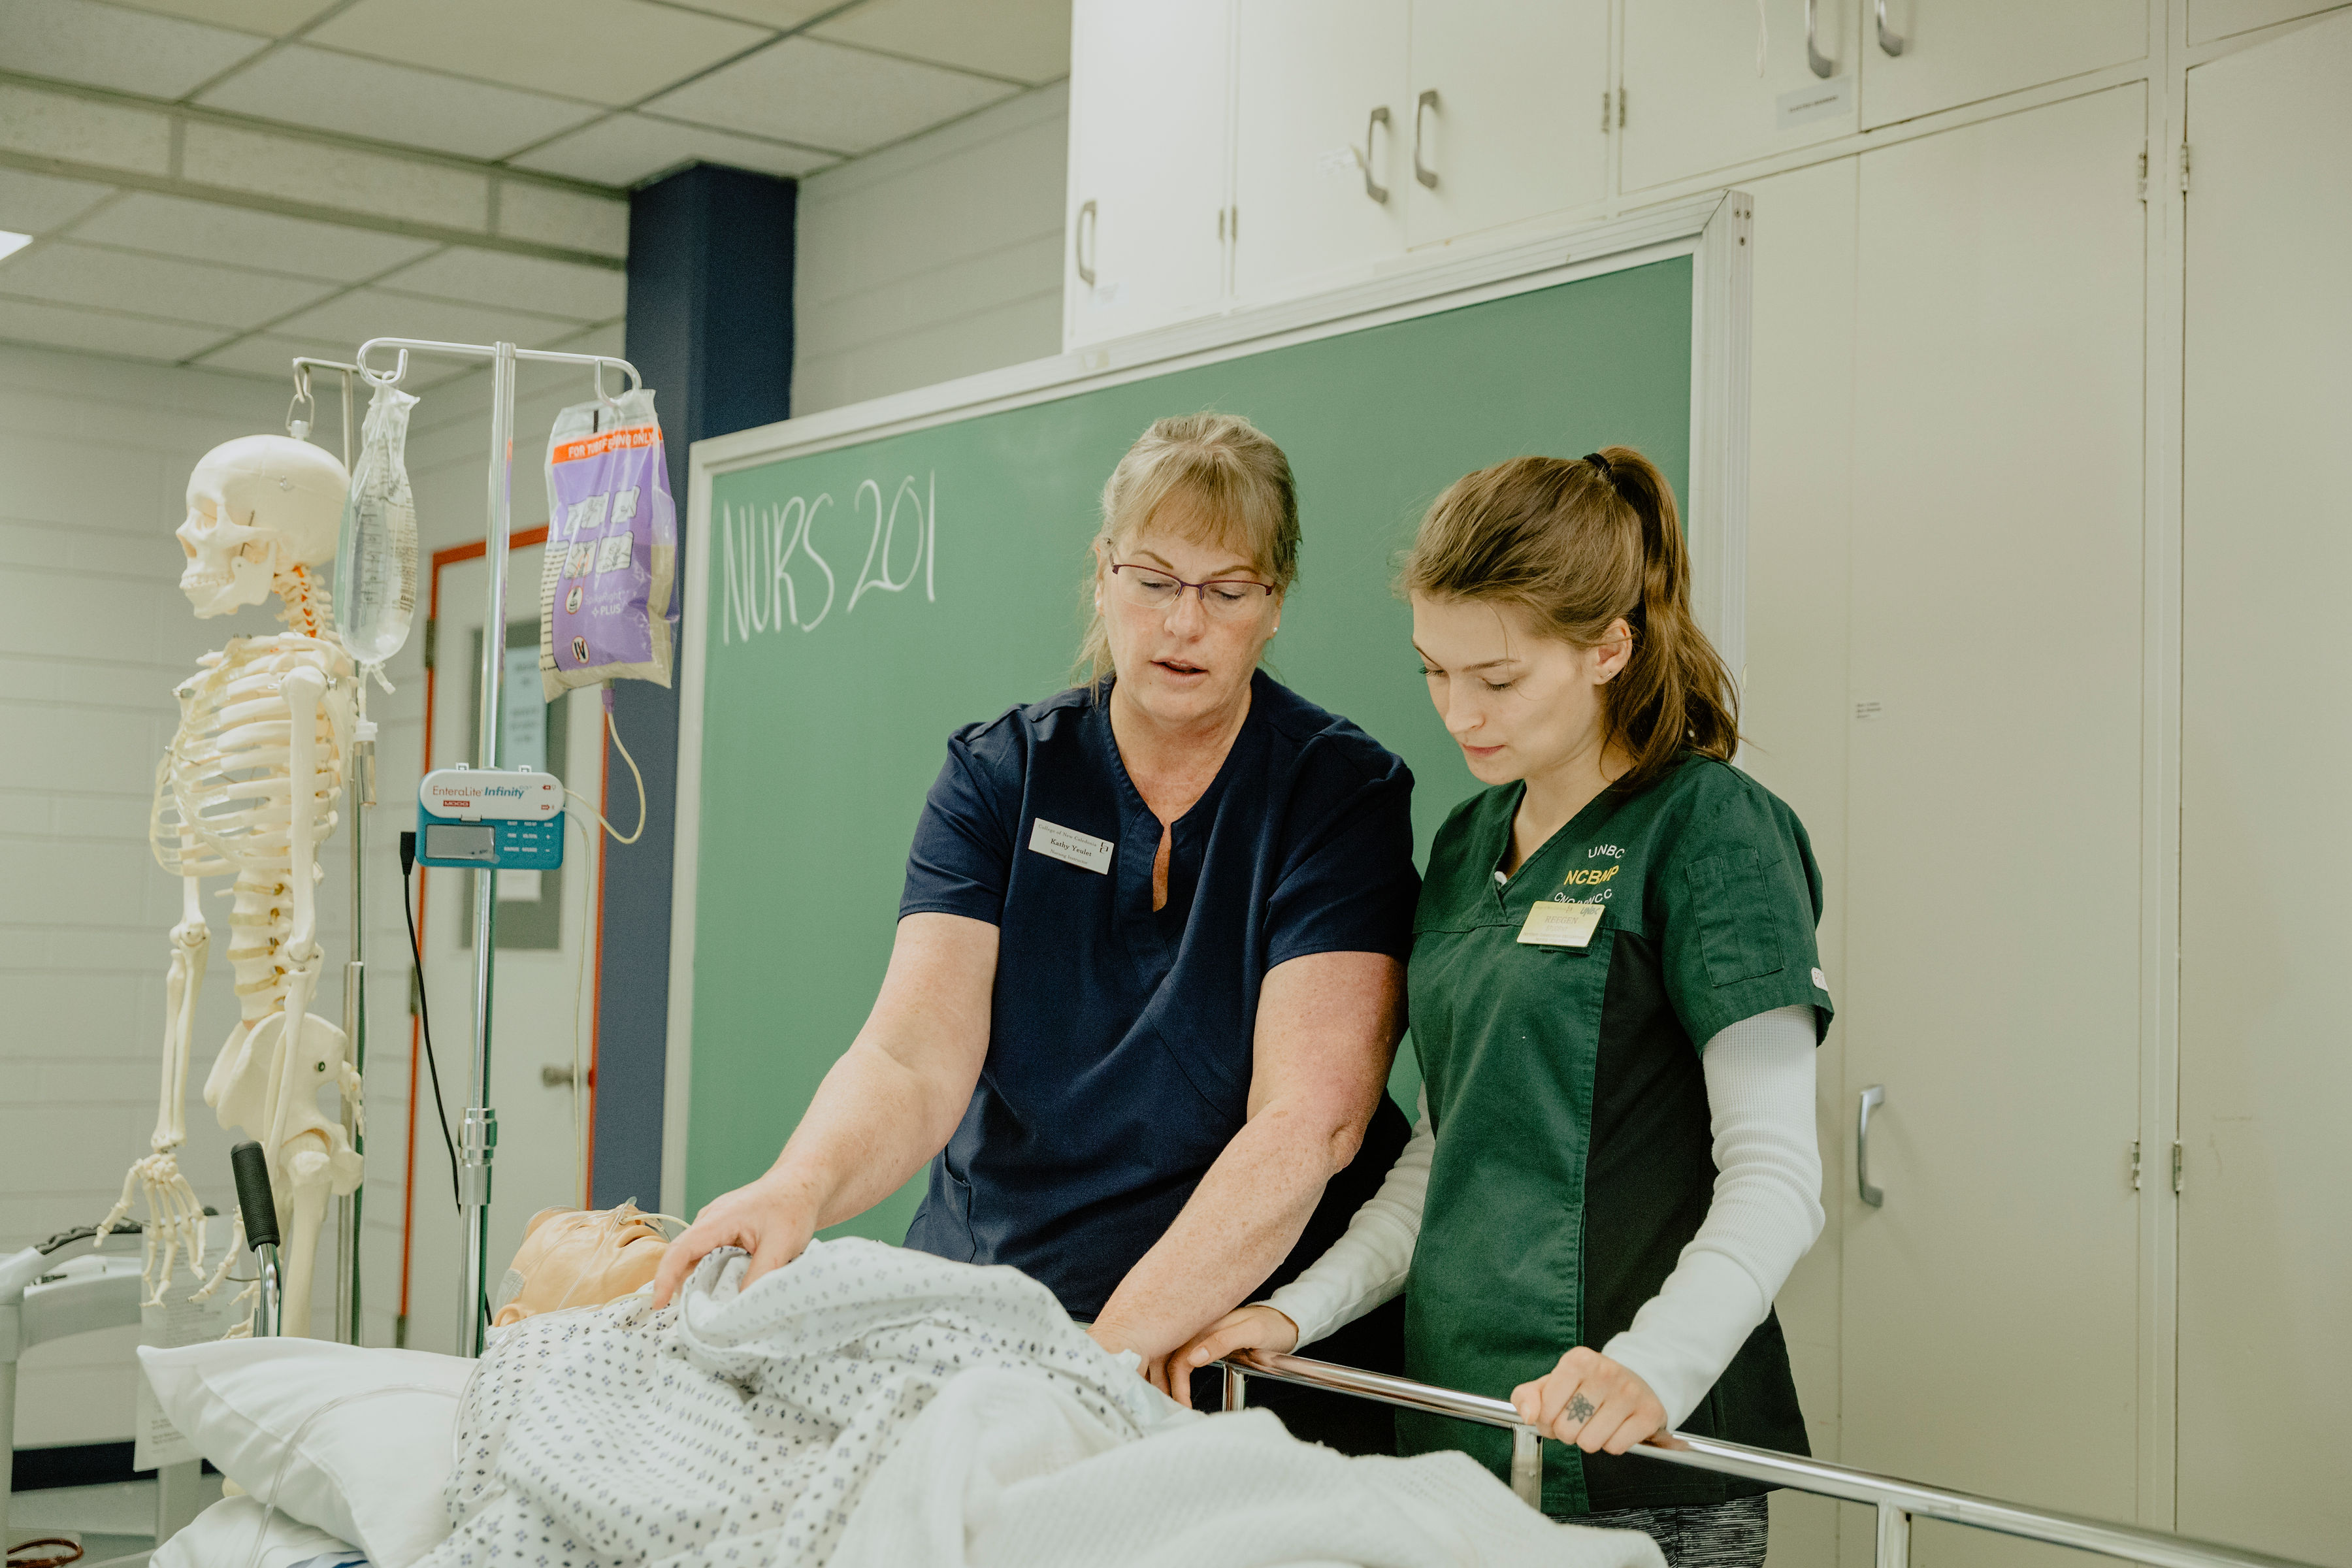 Nursing 4